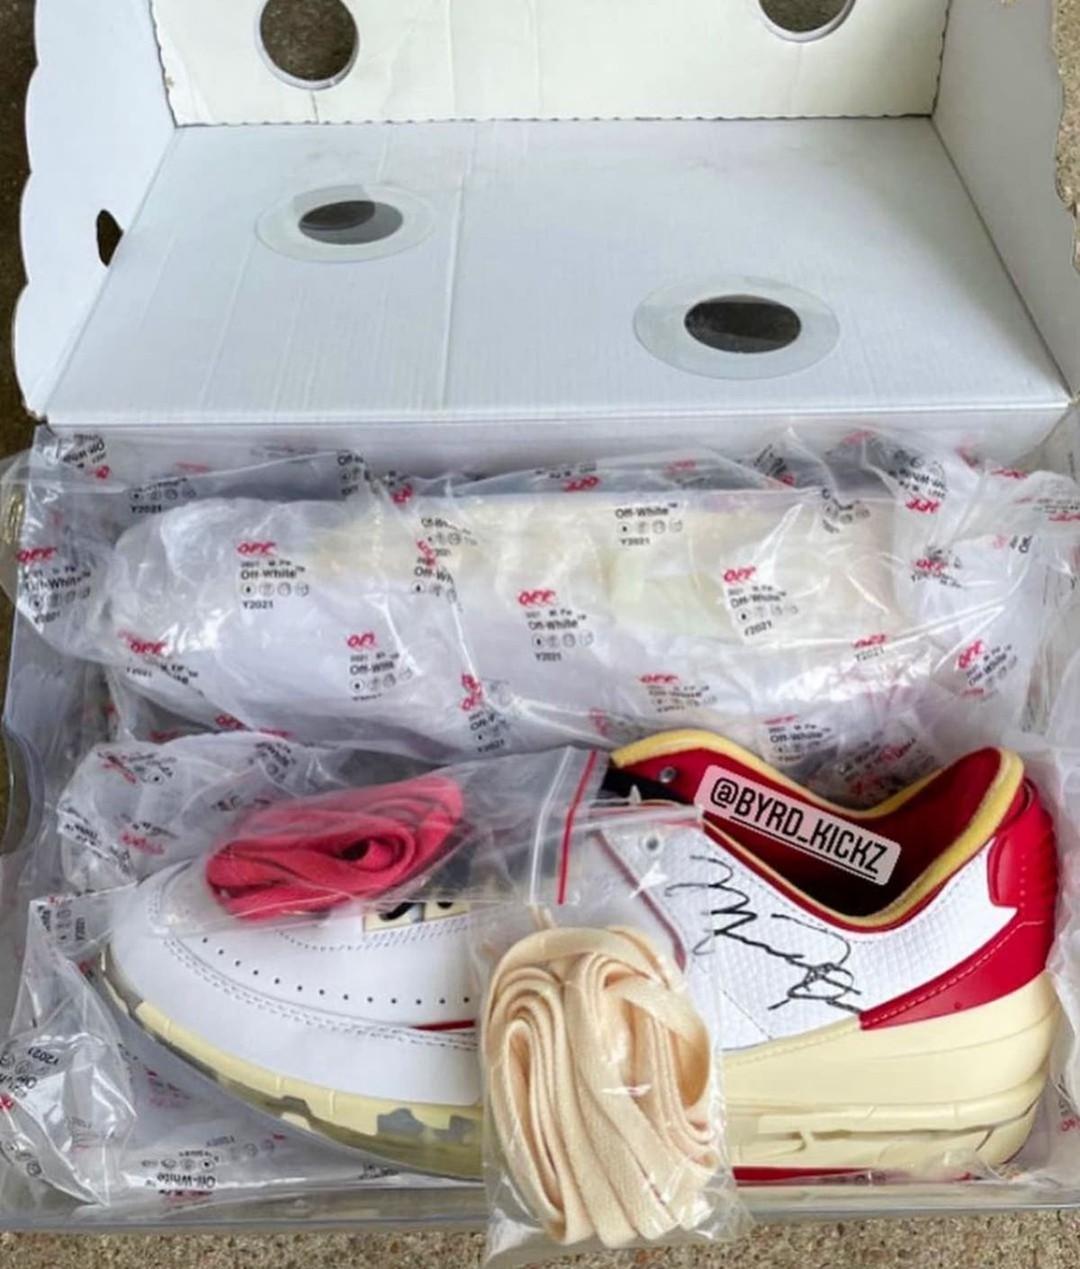 OFF-WHITE,Air Jordan 2 Low,DJ4  年底发售!又是芝加哥又是解构!OW x AJ2 最新实物曝光!